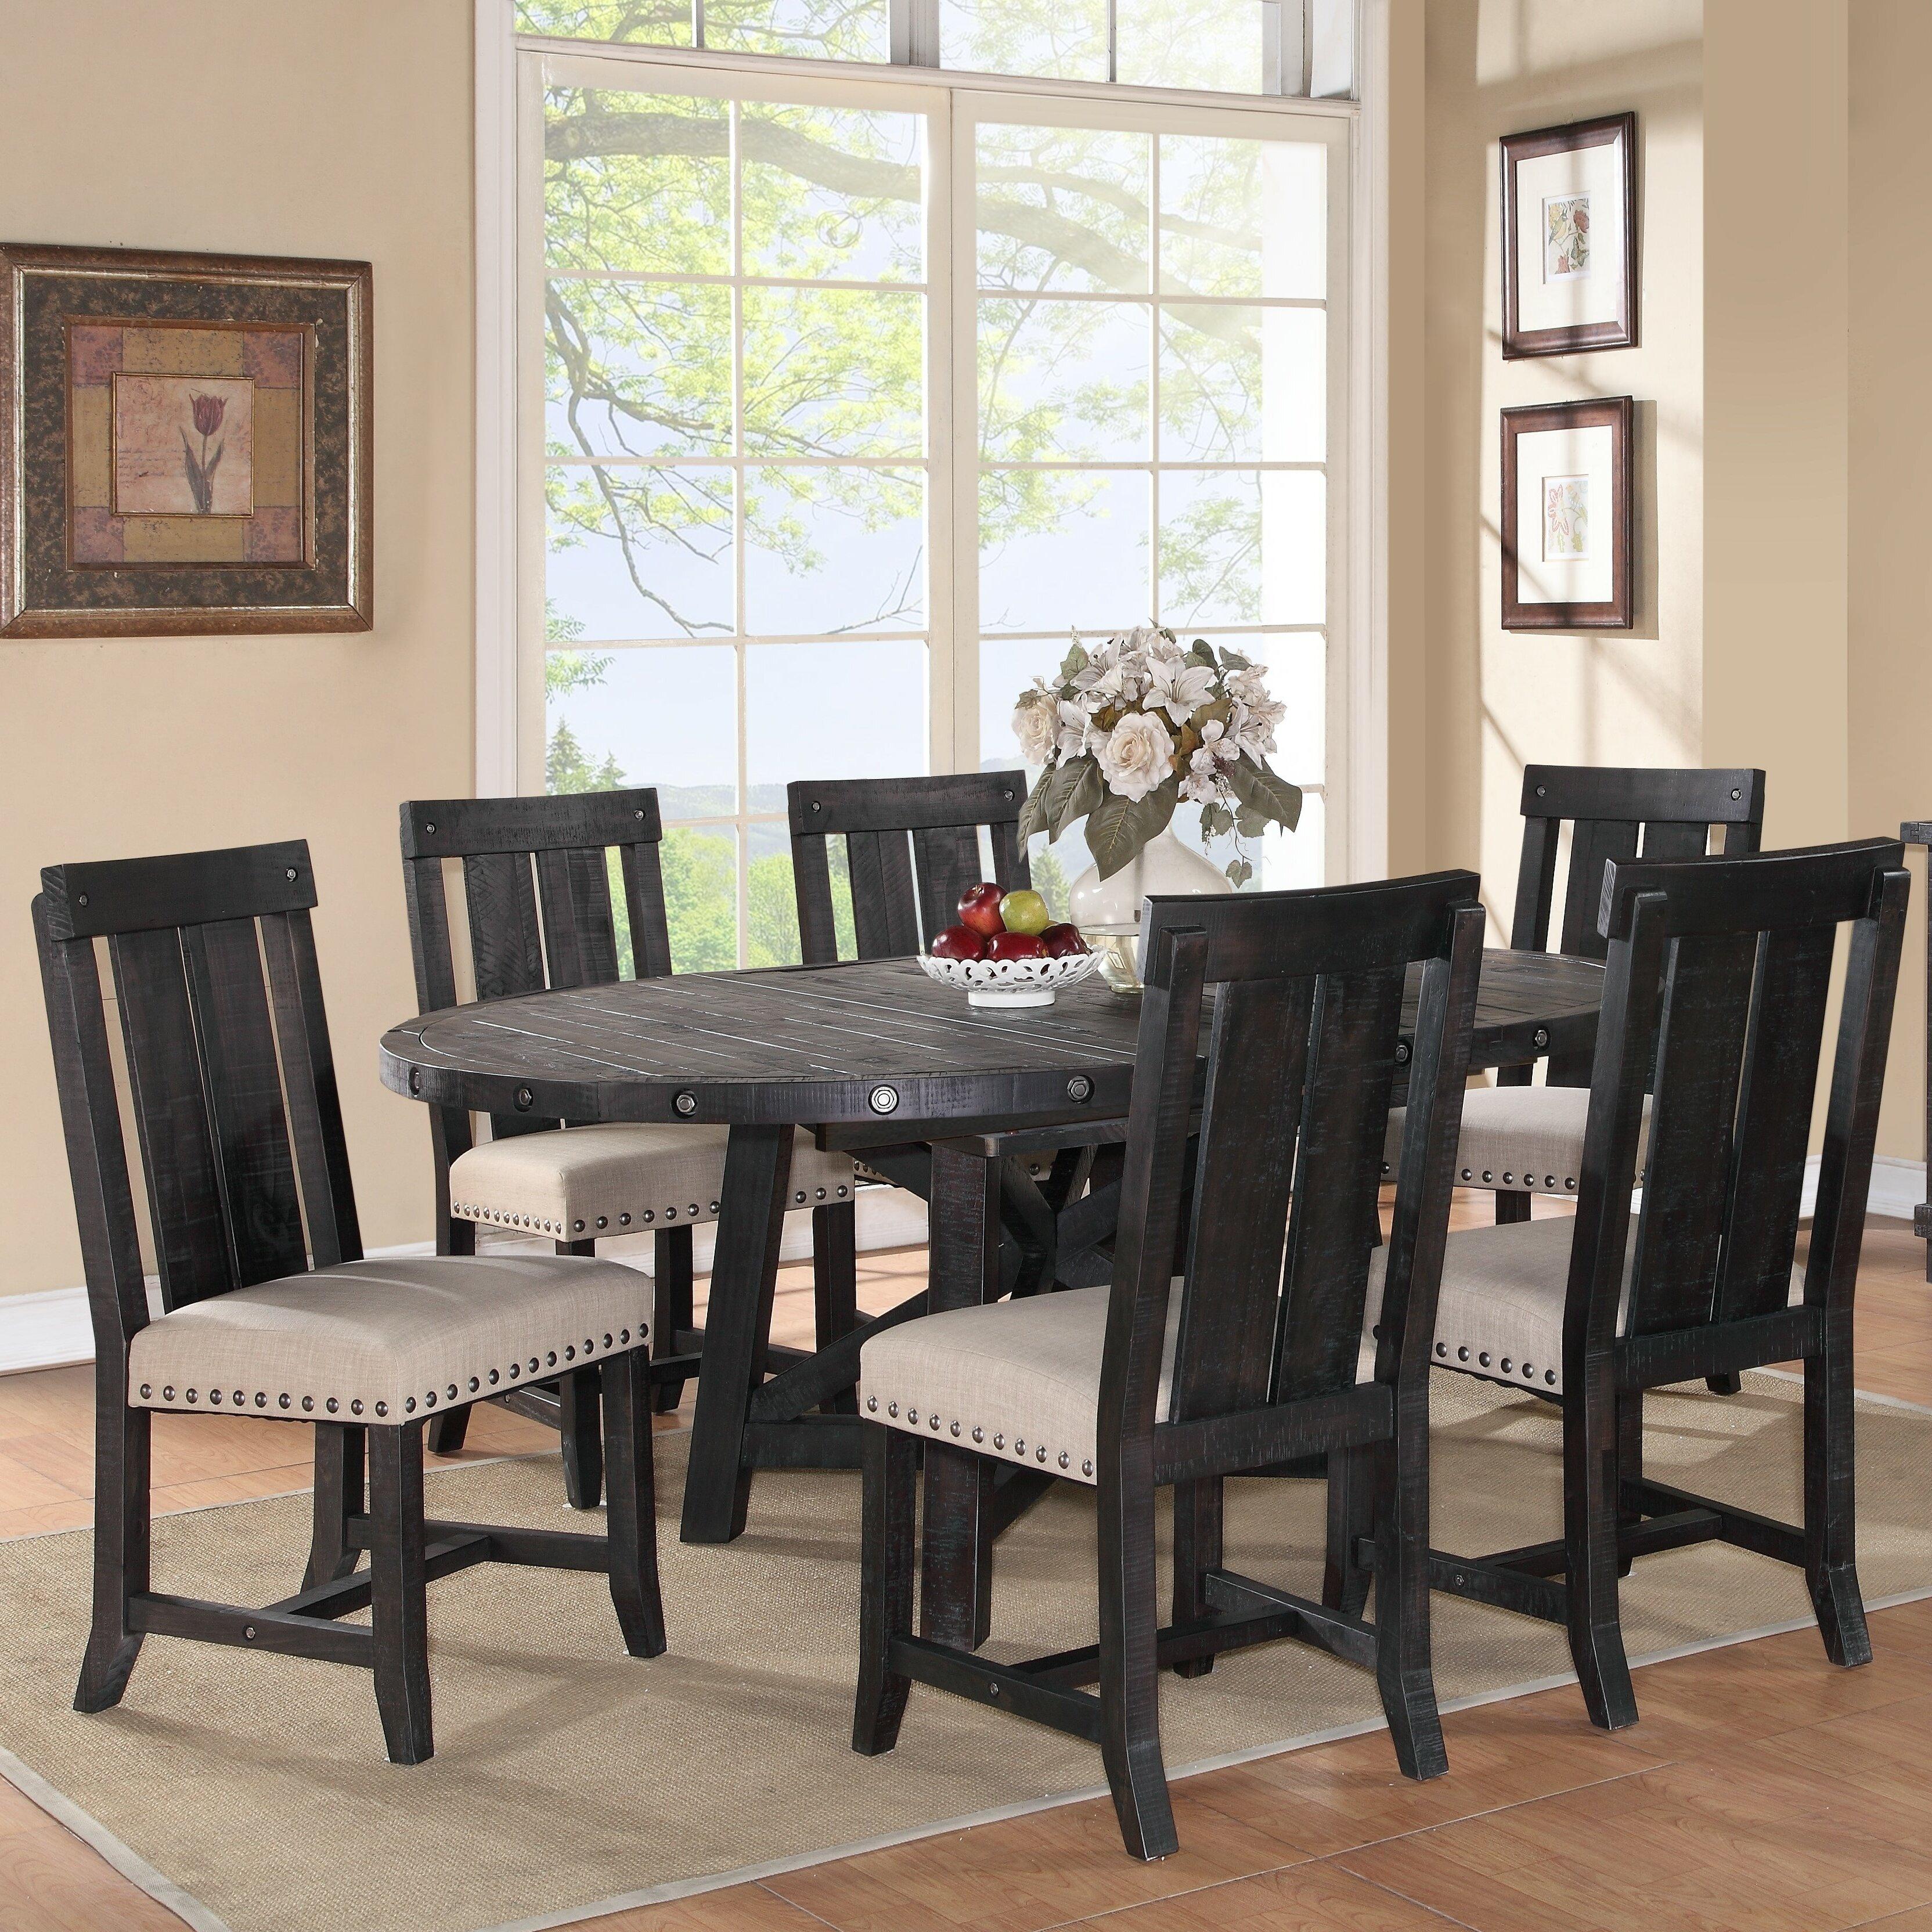 trent austin design del rio extendable dining table reviews